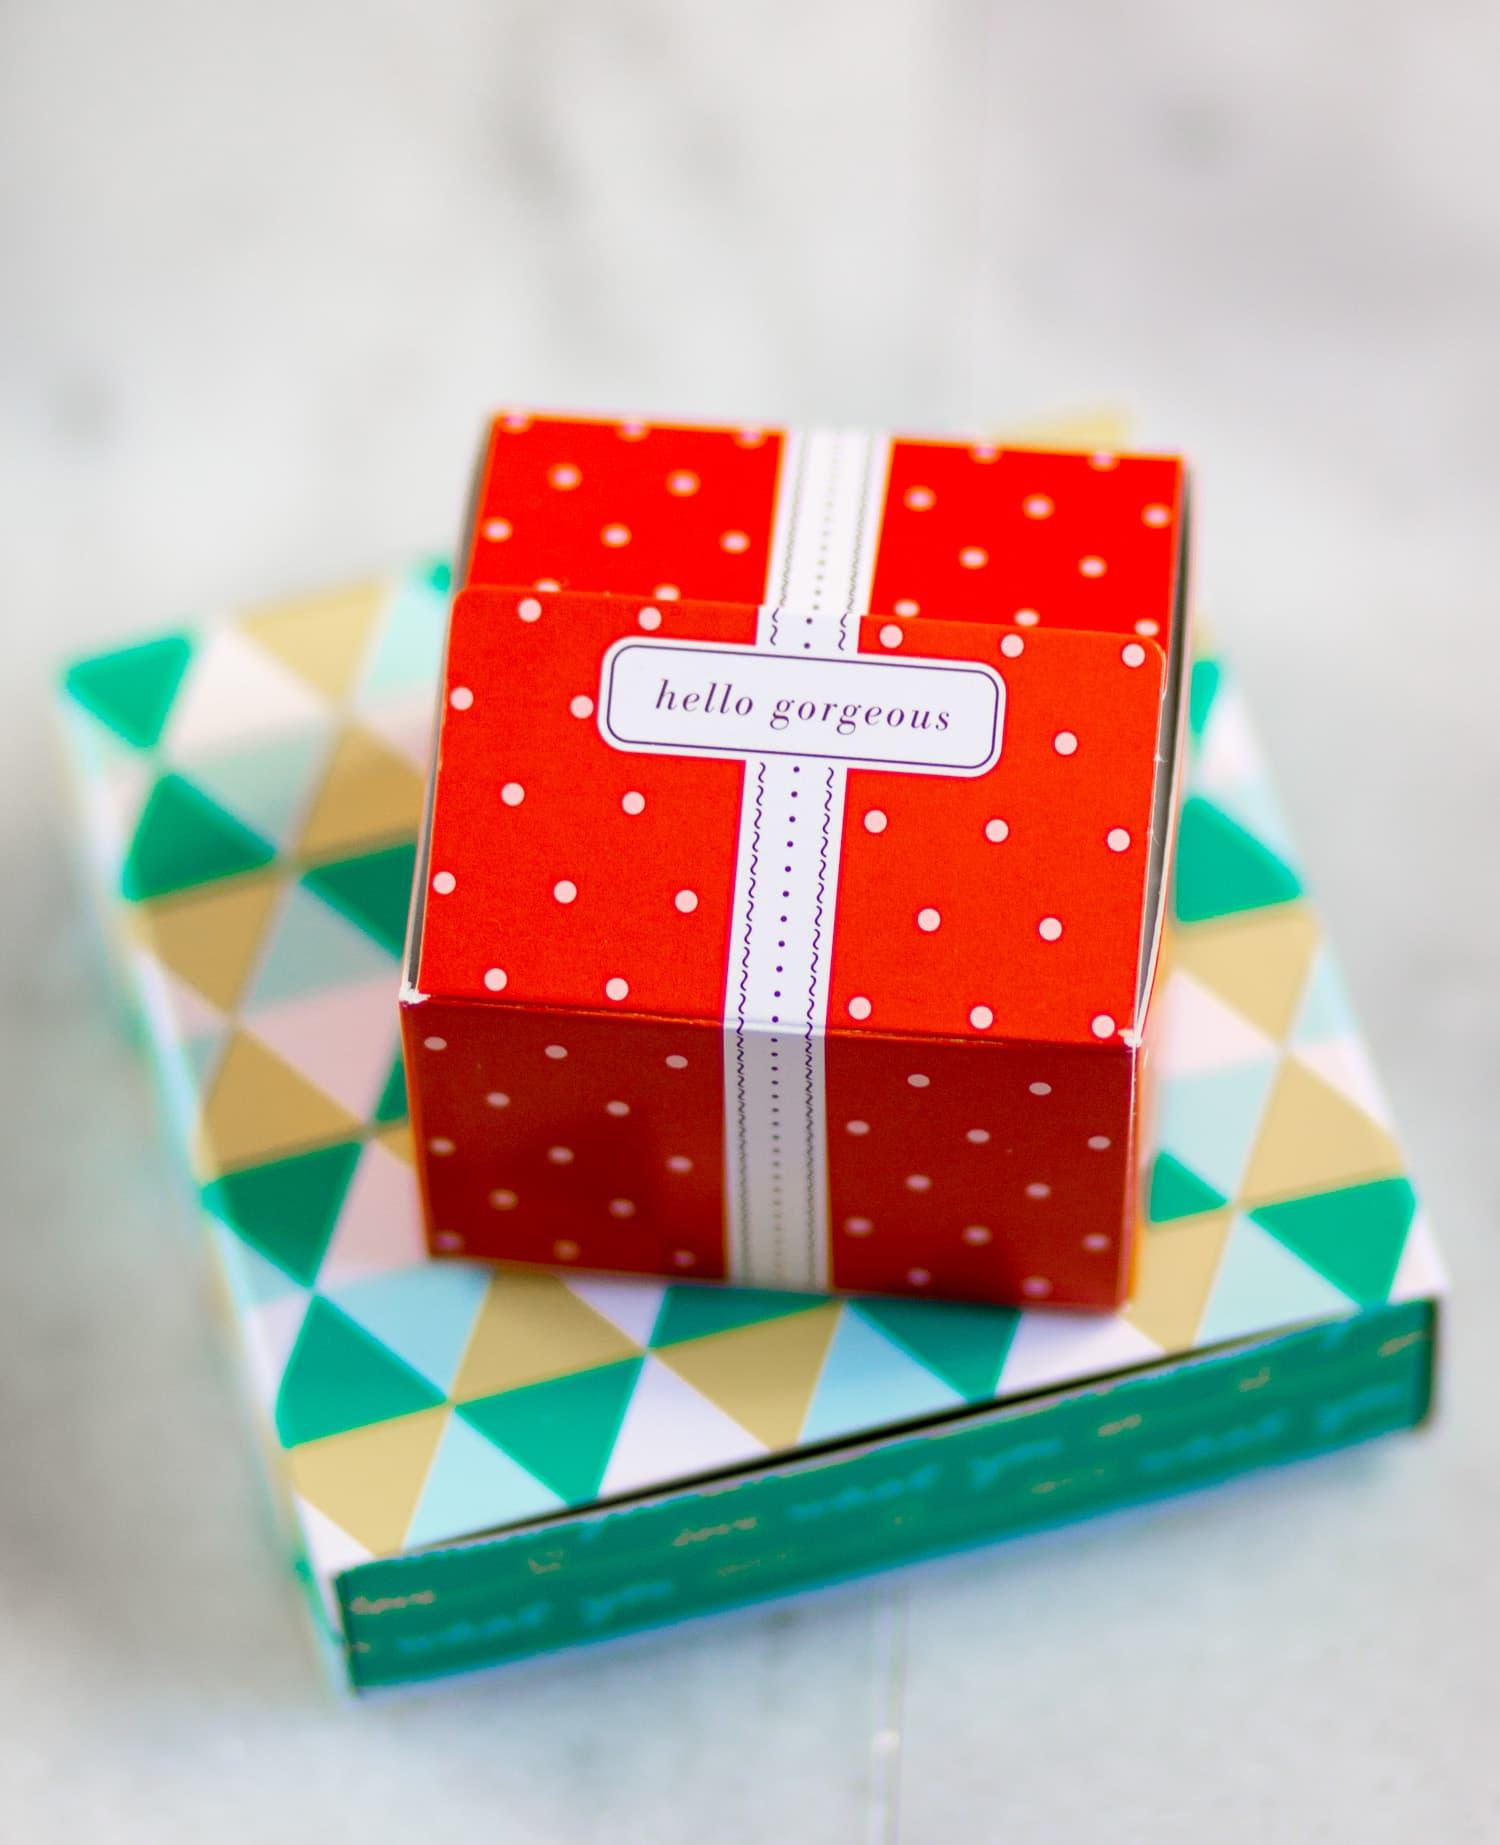 Stella & Dot packaging - hello gorgeous